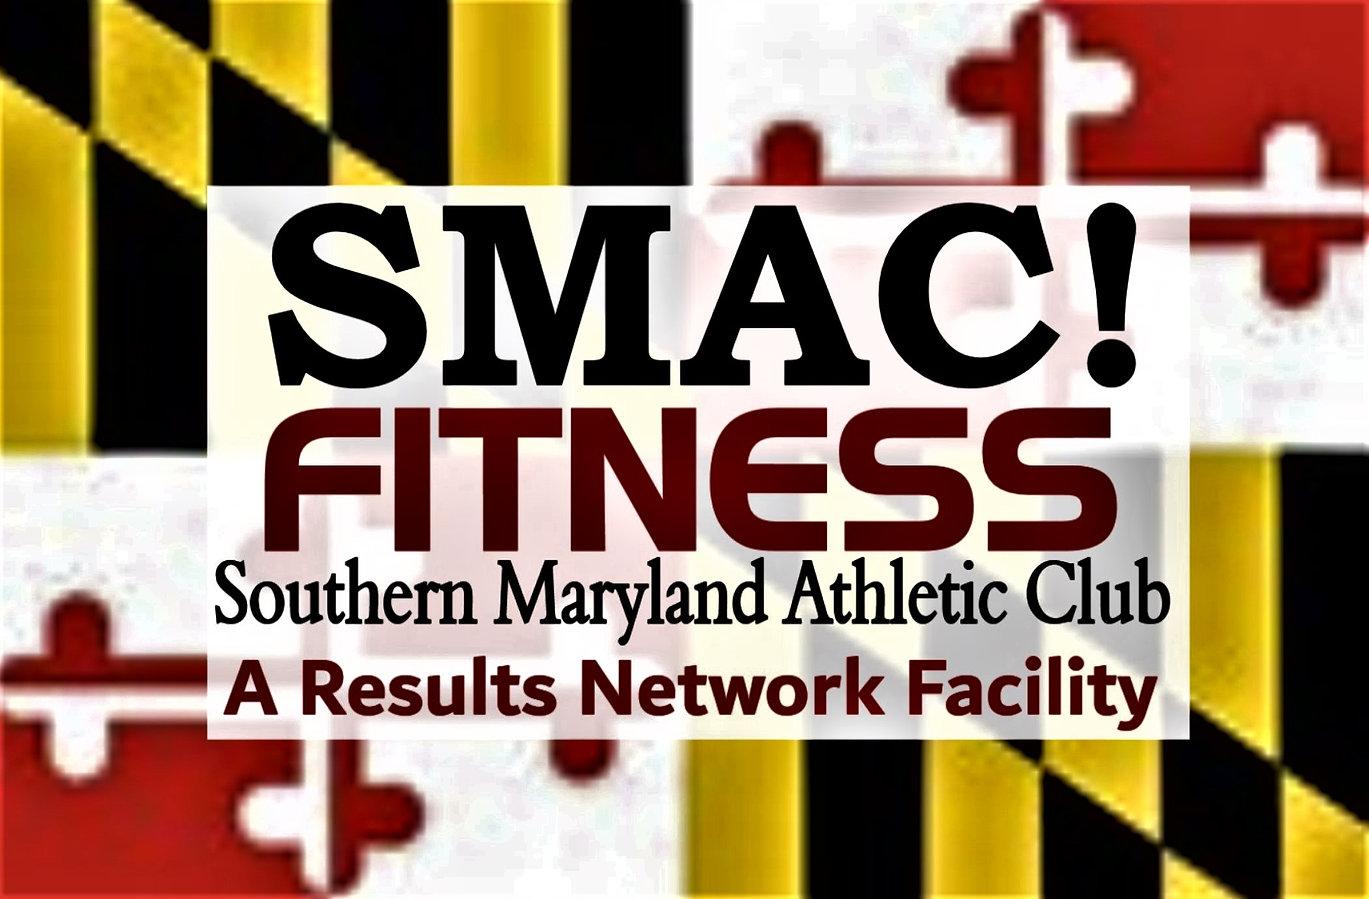 SMAC Logo4-page1 (3).jpg